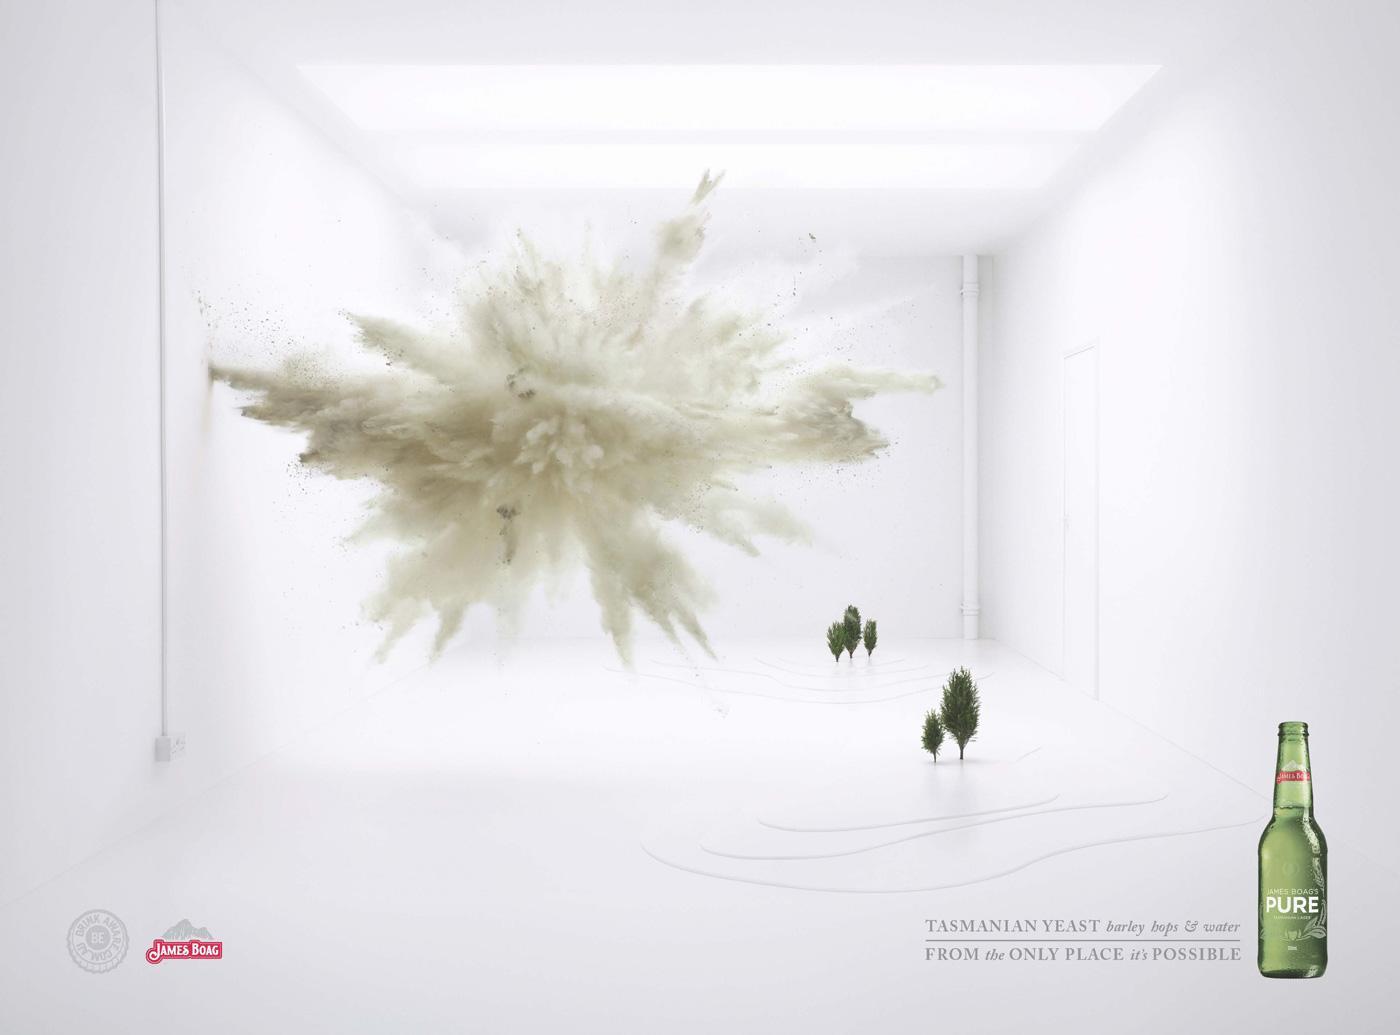 James Boag Print Ad -  Explosion, 2